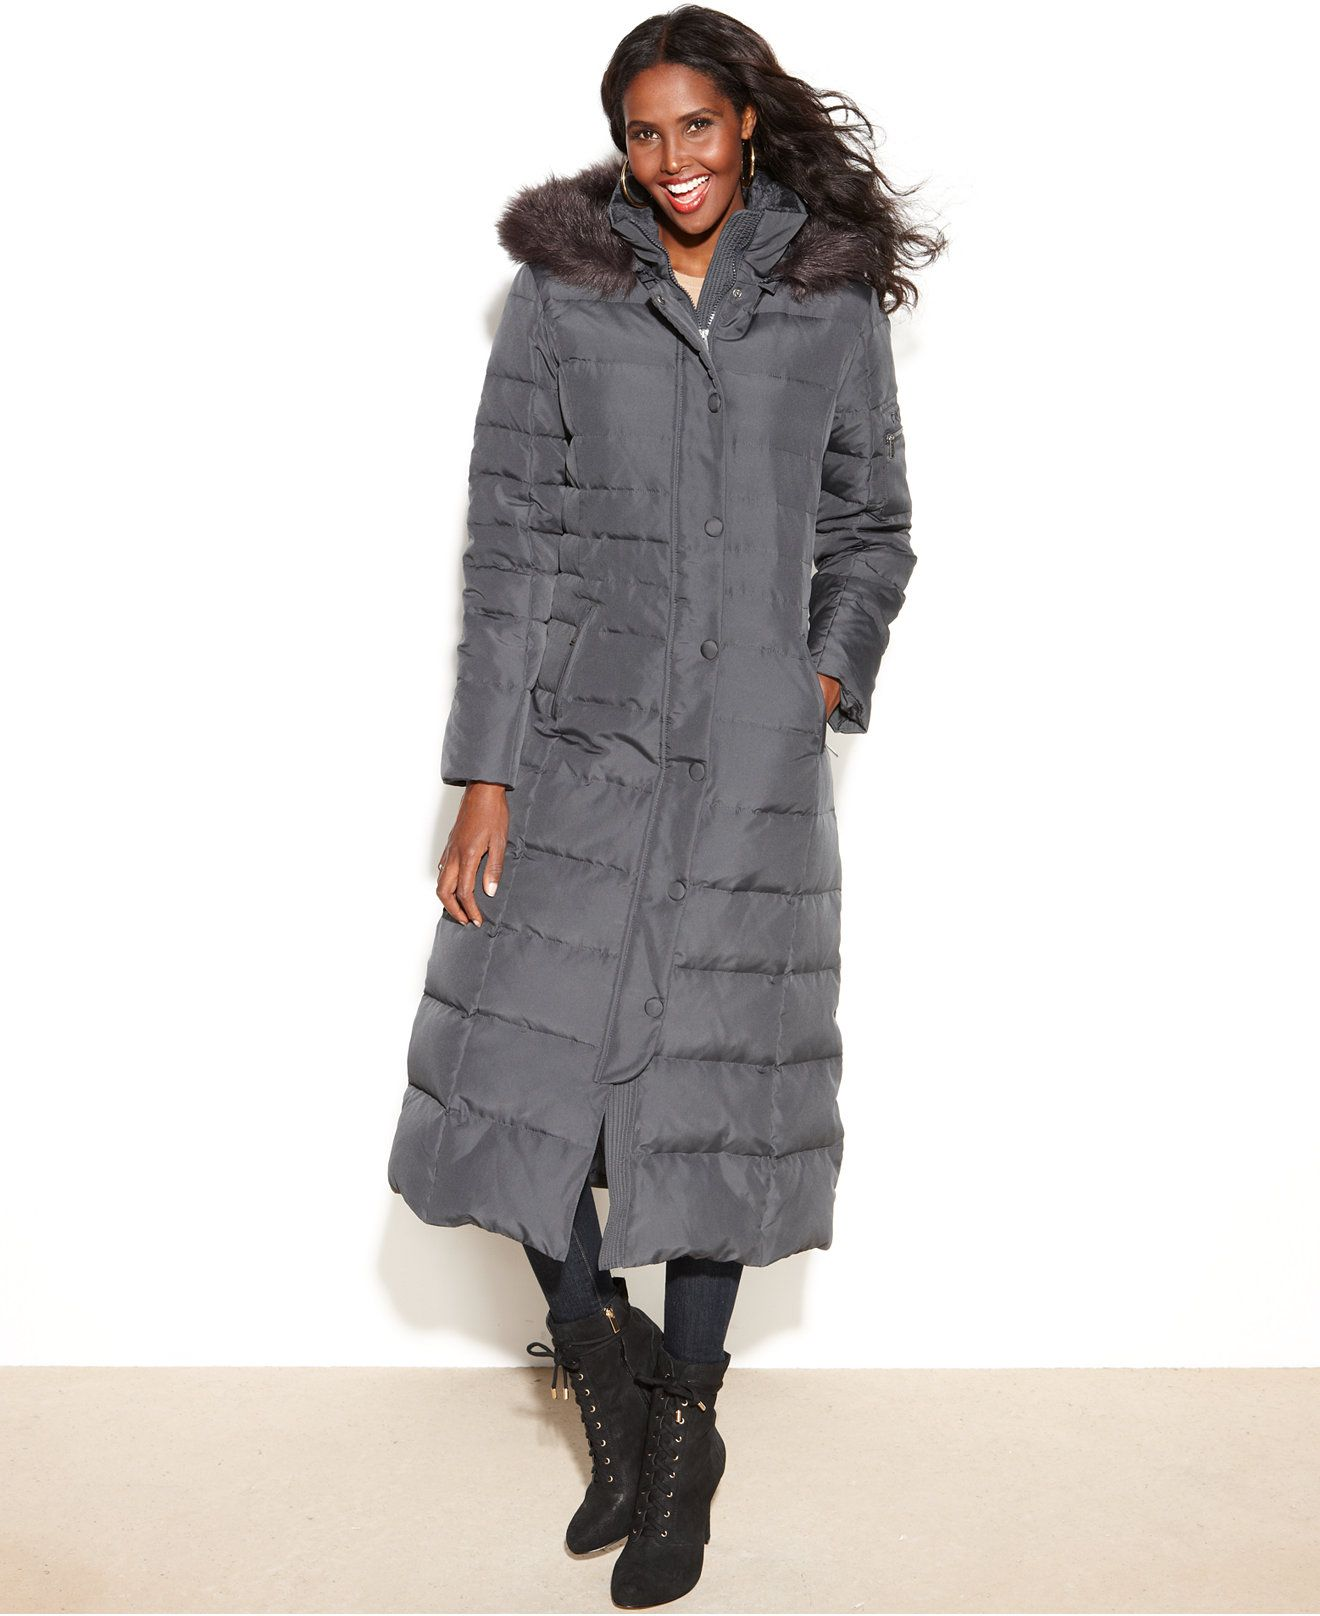 118ae18b78c2c DKNY Petite Hooded Faux-Fur-Trim Maxi Down Puffer Coat - Coats - Women -  Macy s